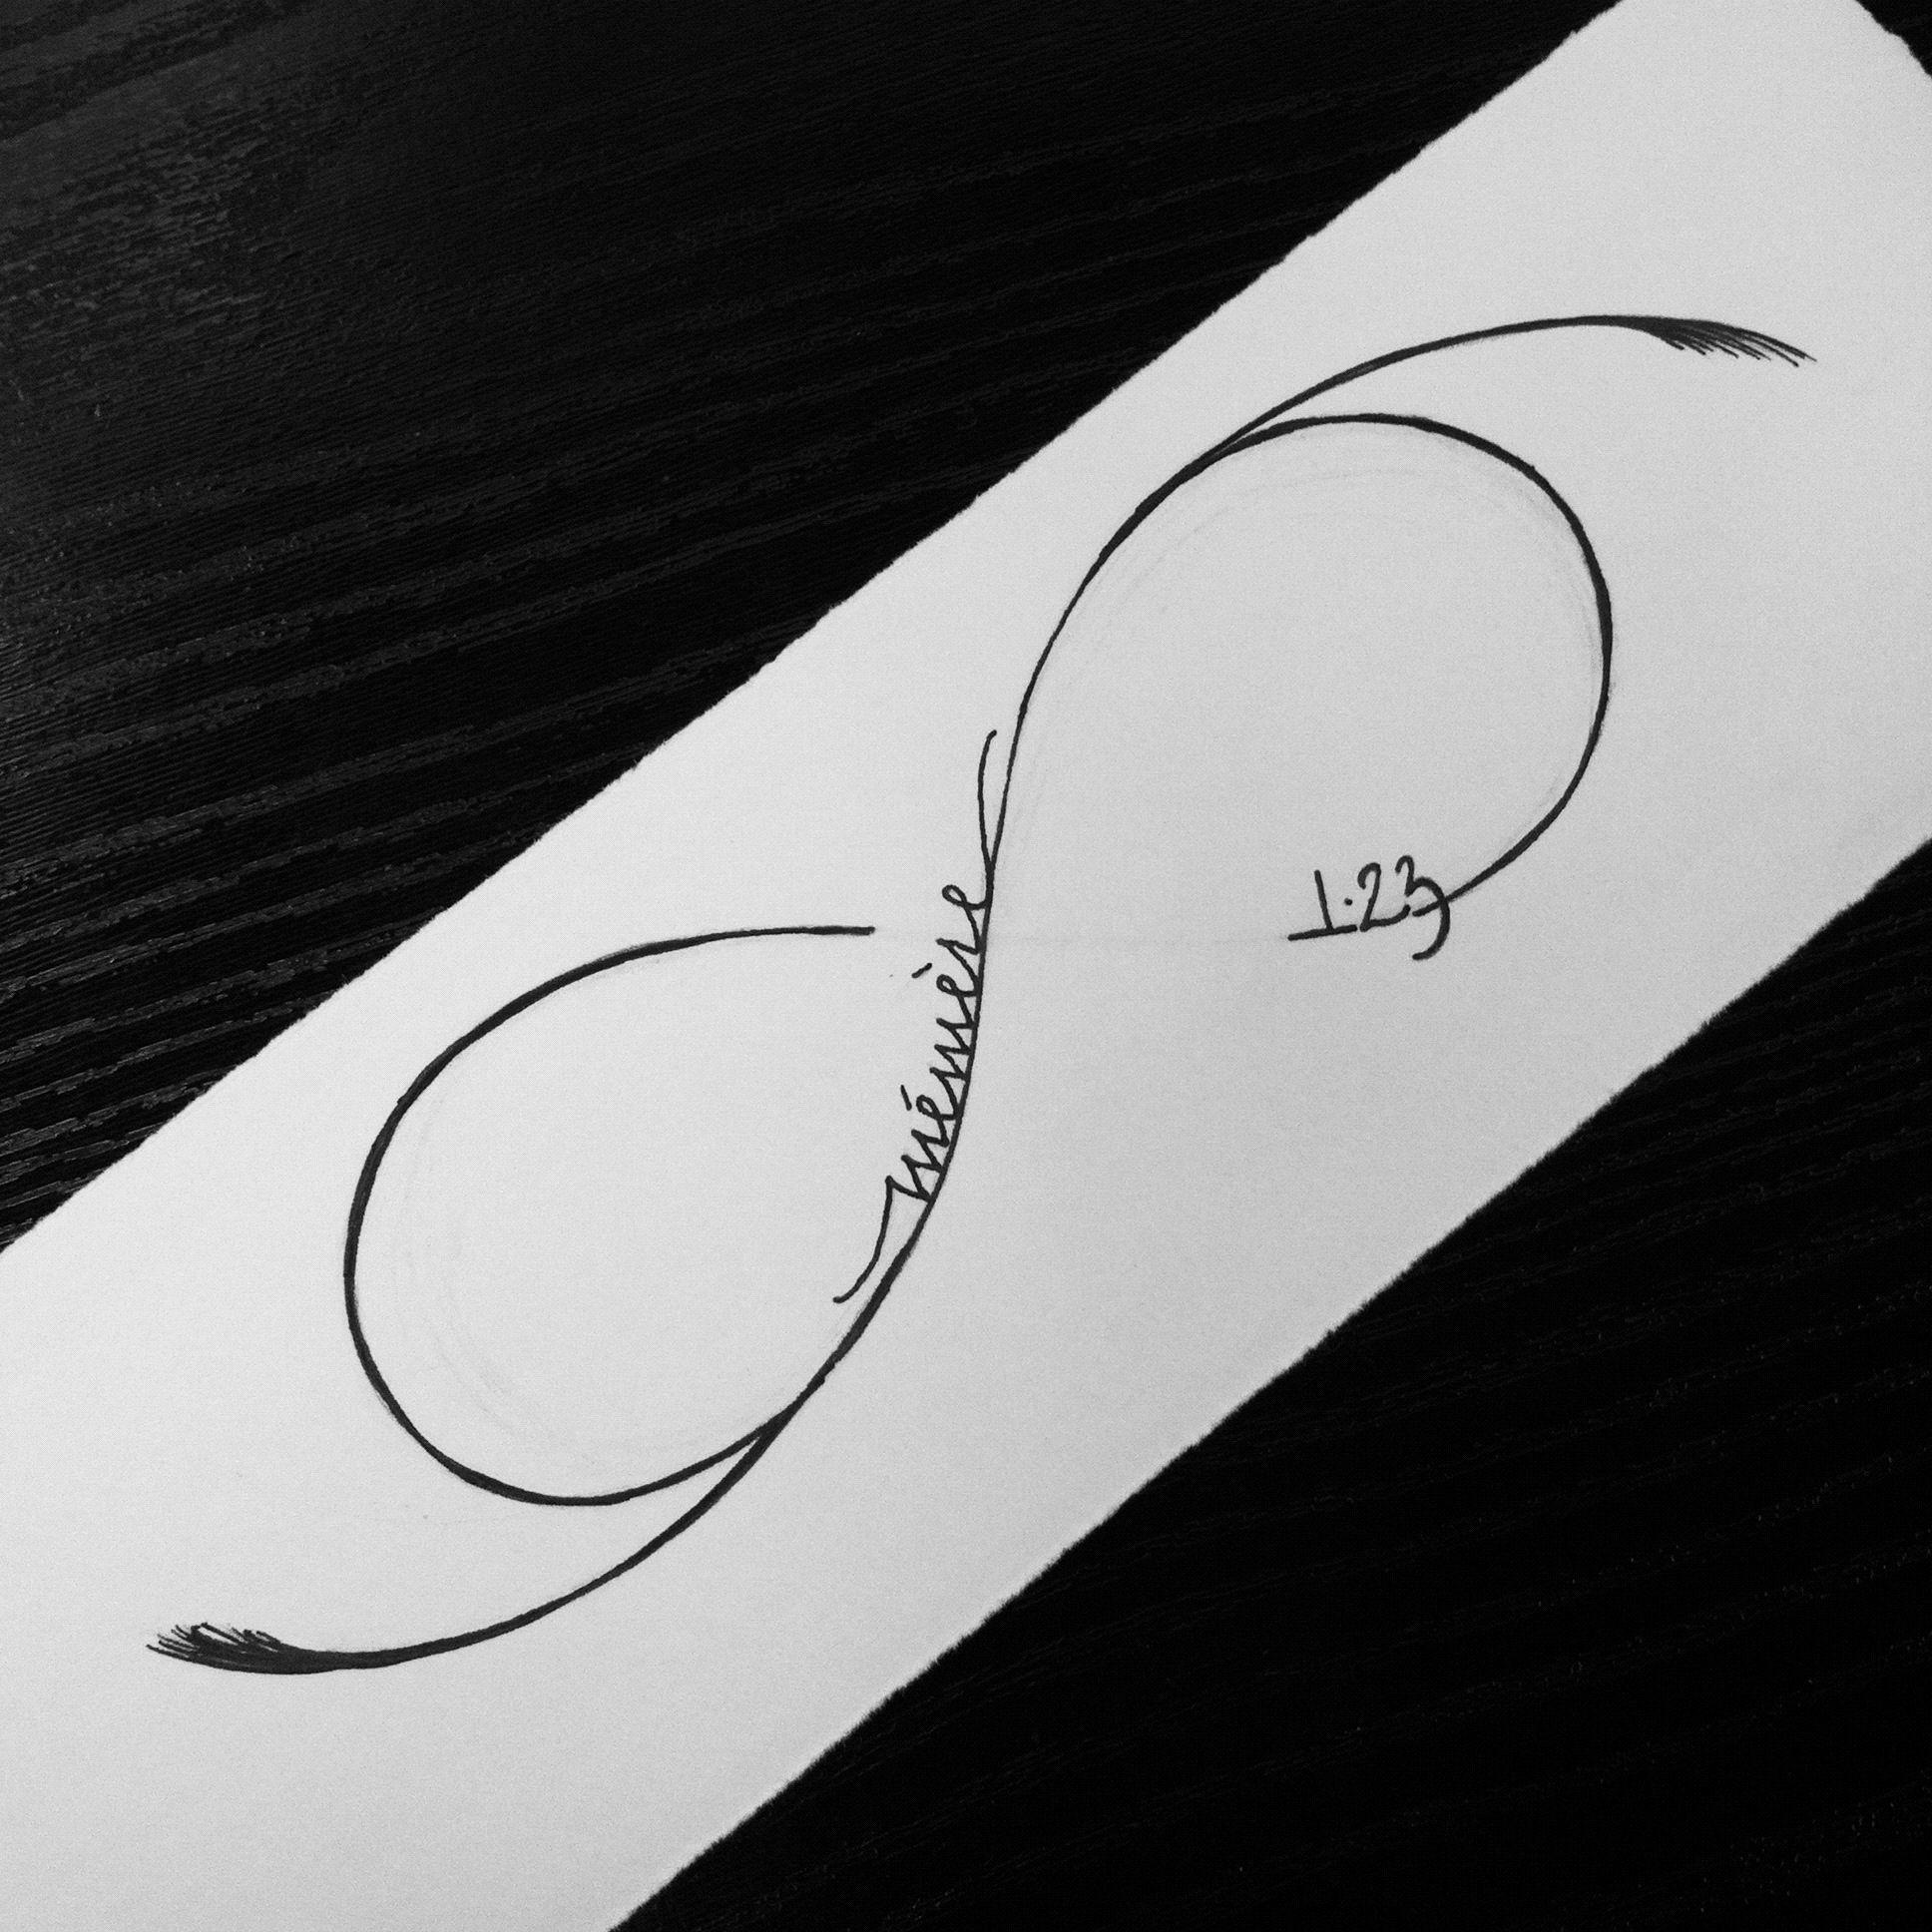 tattooing like whoa Infinity symbol, Symbols and Infinity